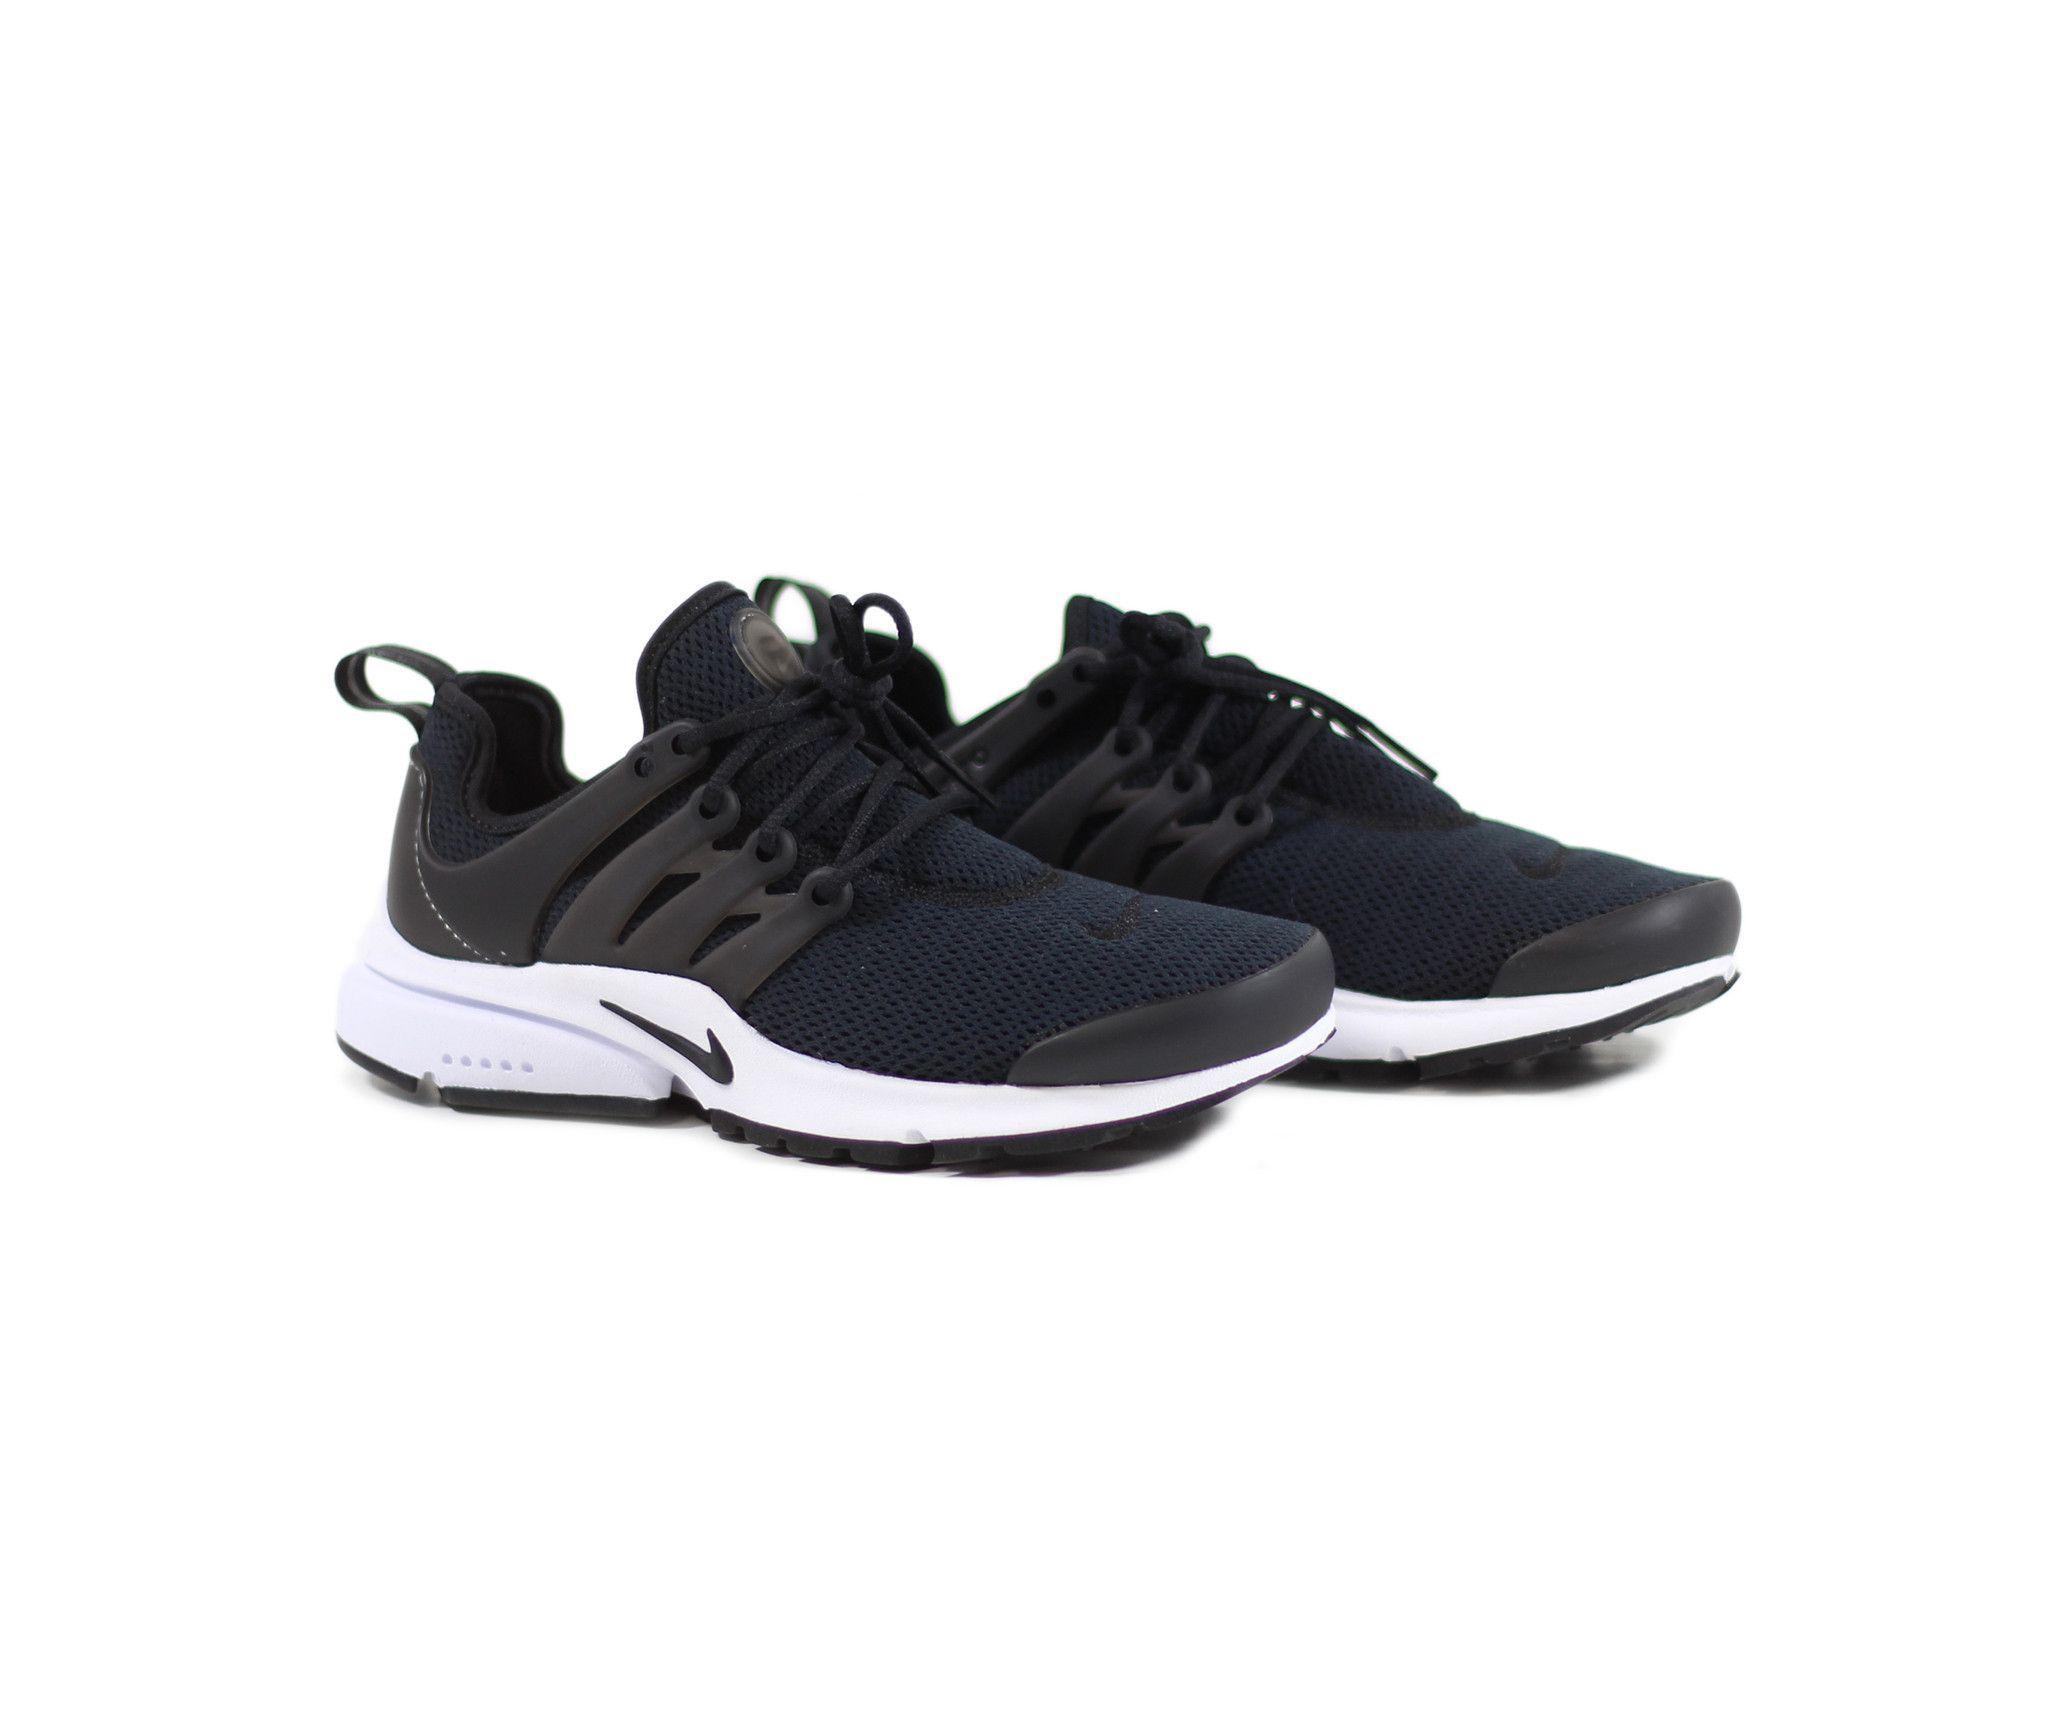 f08601d2753 ... Kids Running Shoes 870023- ... fast delivery 8b711 e82e9 NIKE WMNS Air  Presto - BlackBlack-White .